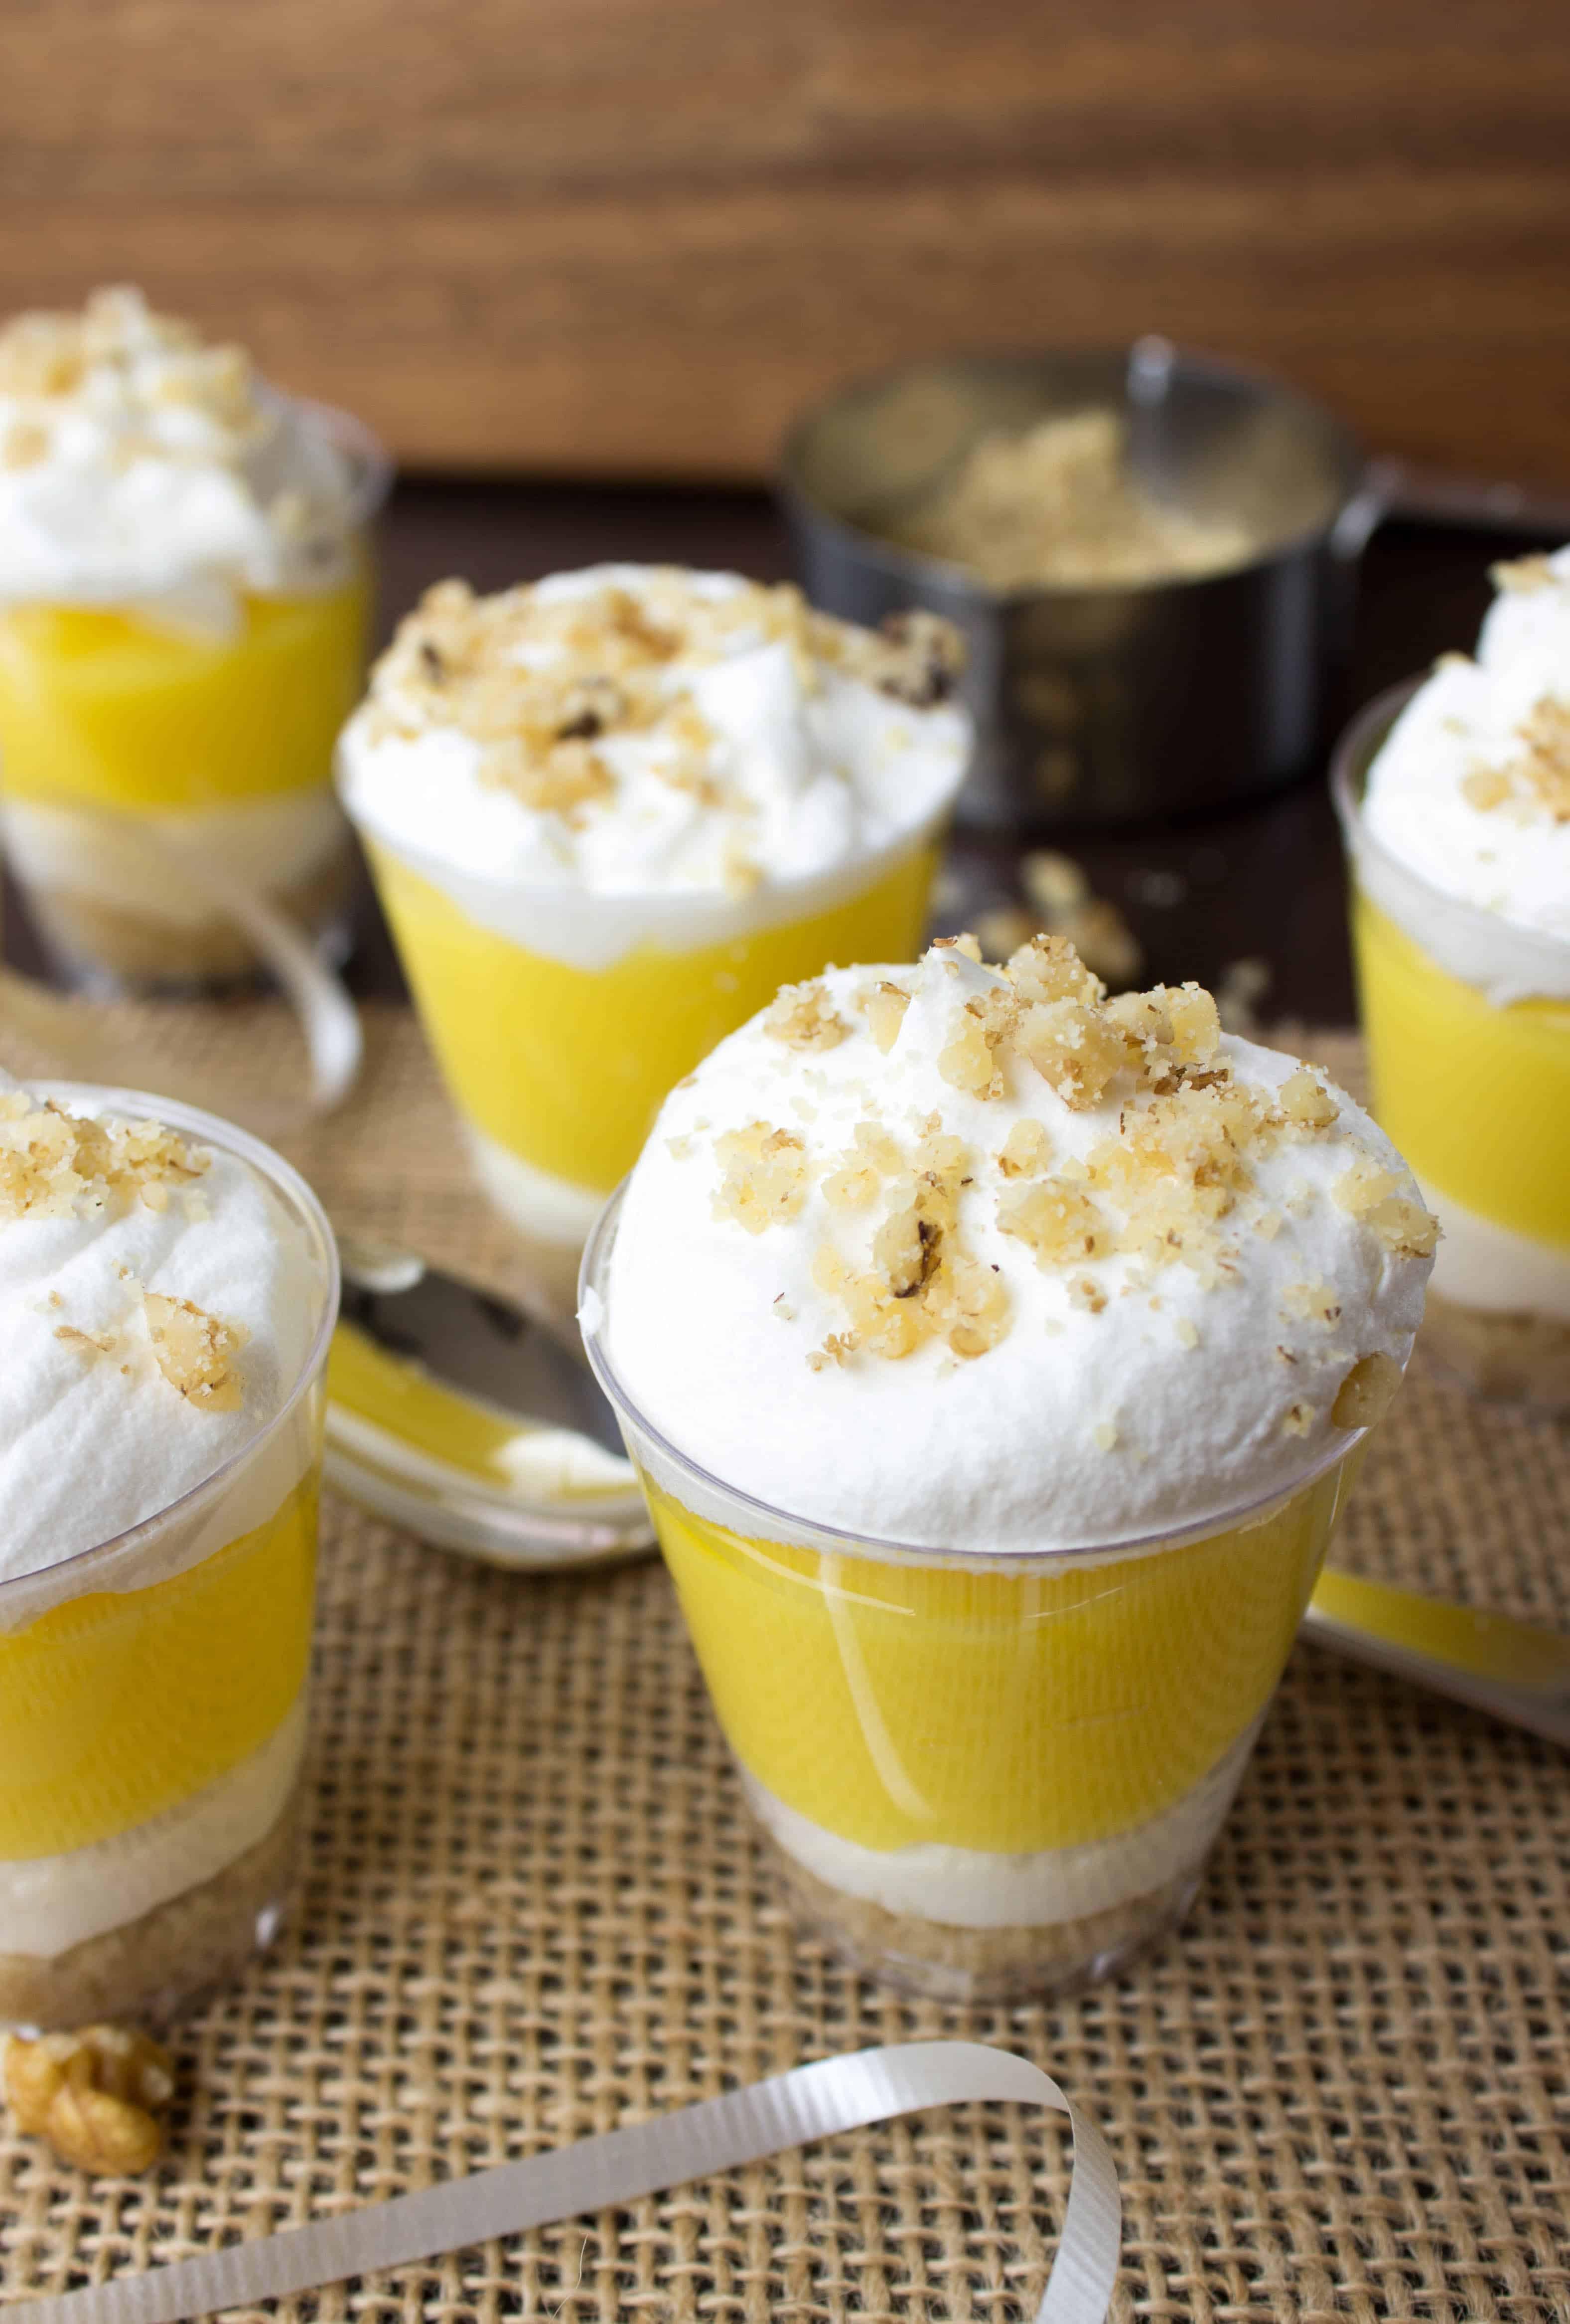 Lemon Lush Desserts  Lemon Lush Dessert Shooters